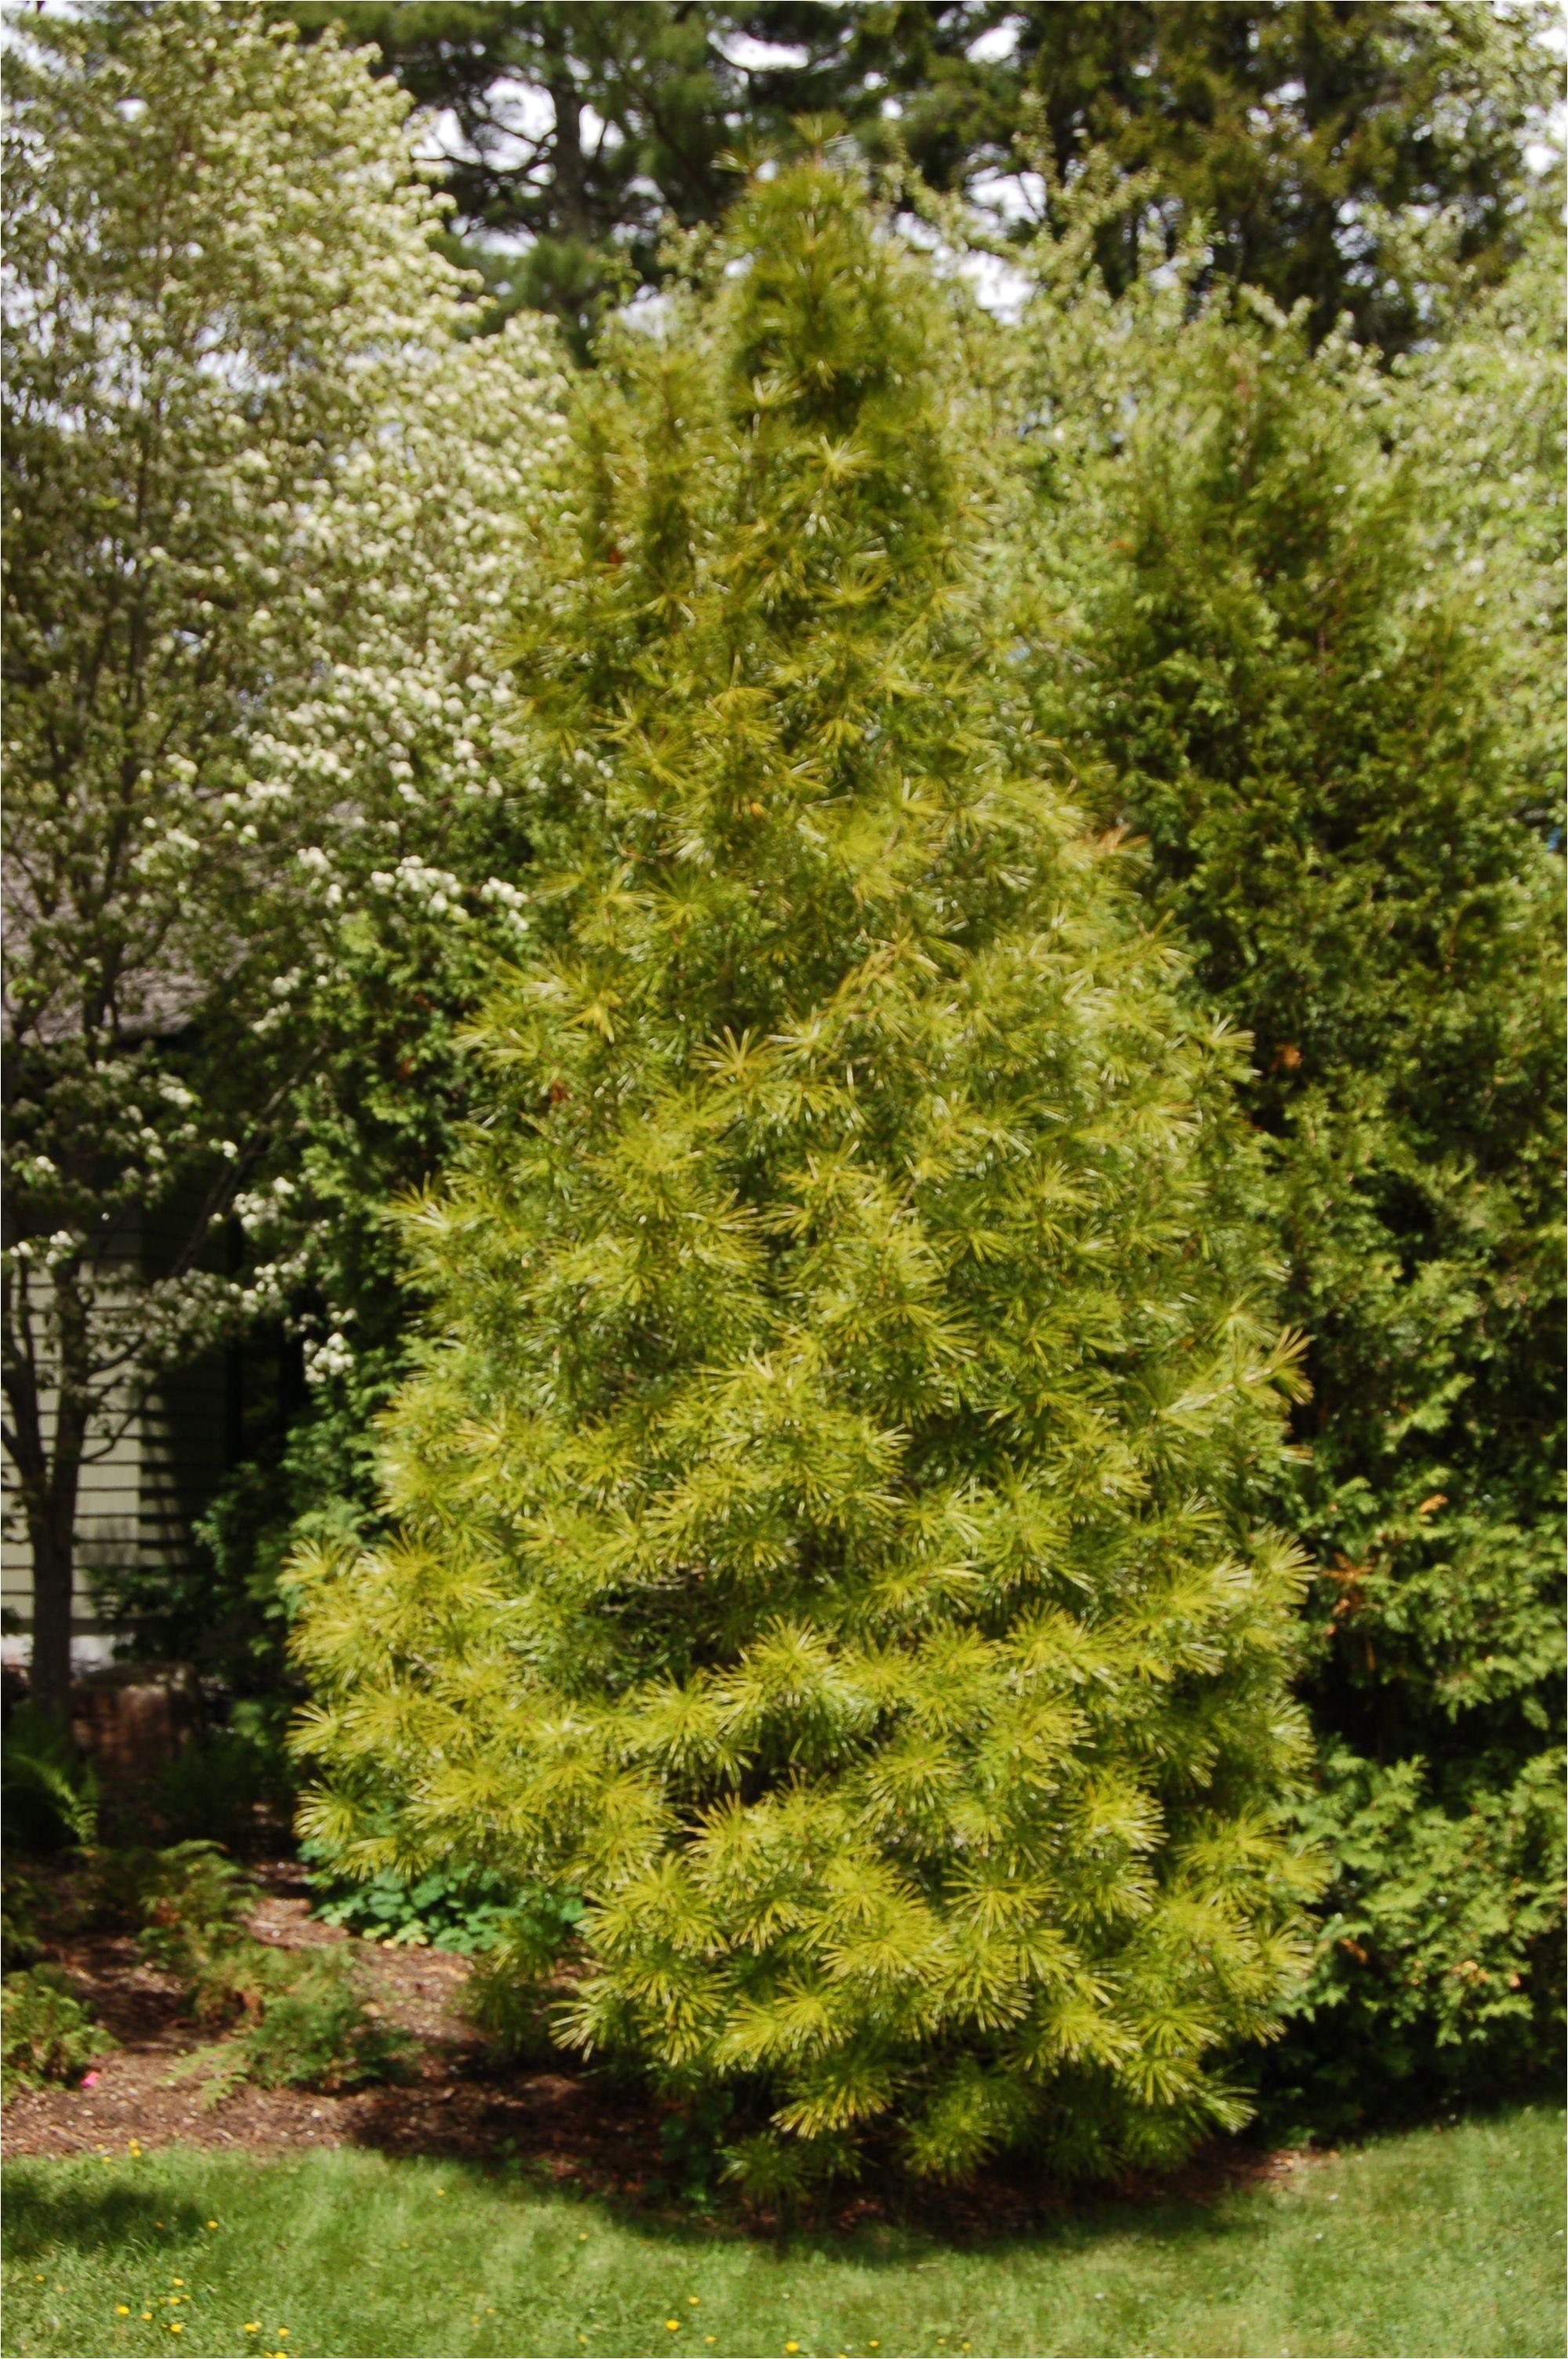 Decorative Pine Trees For Landscaping Japanese Umbrella Pine